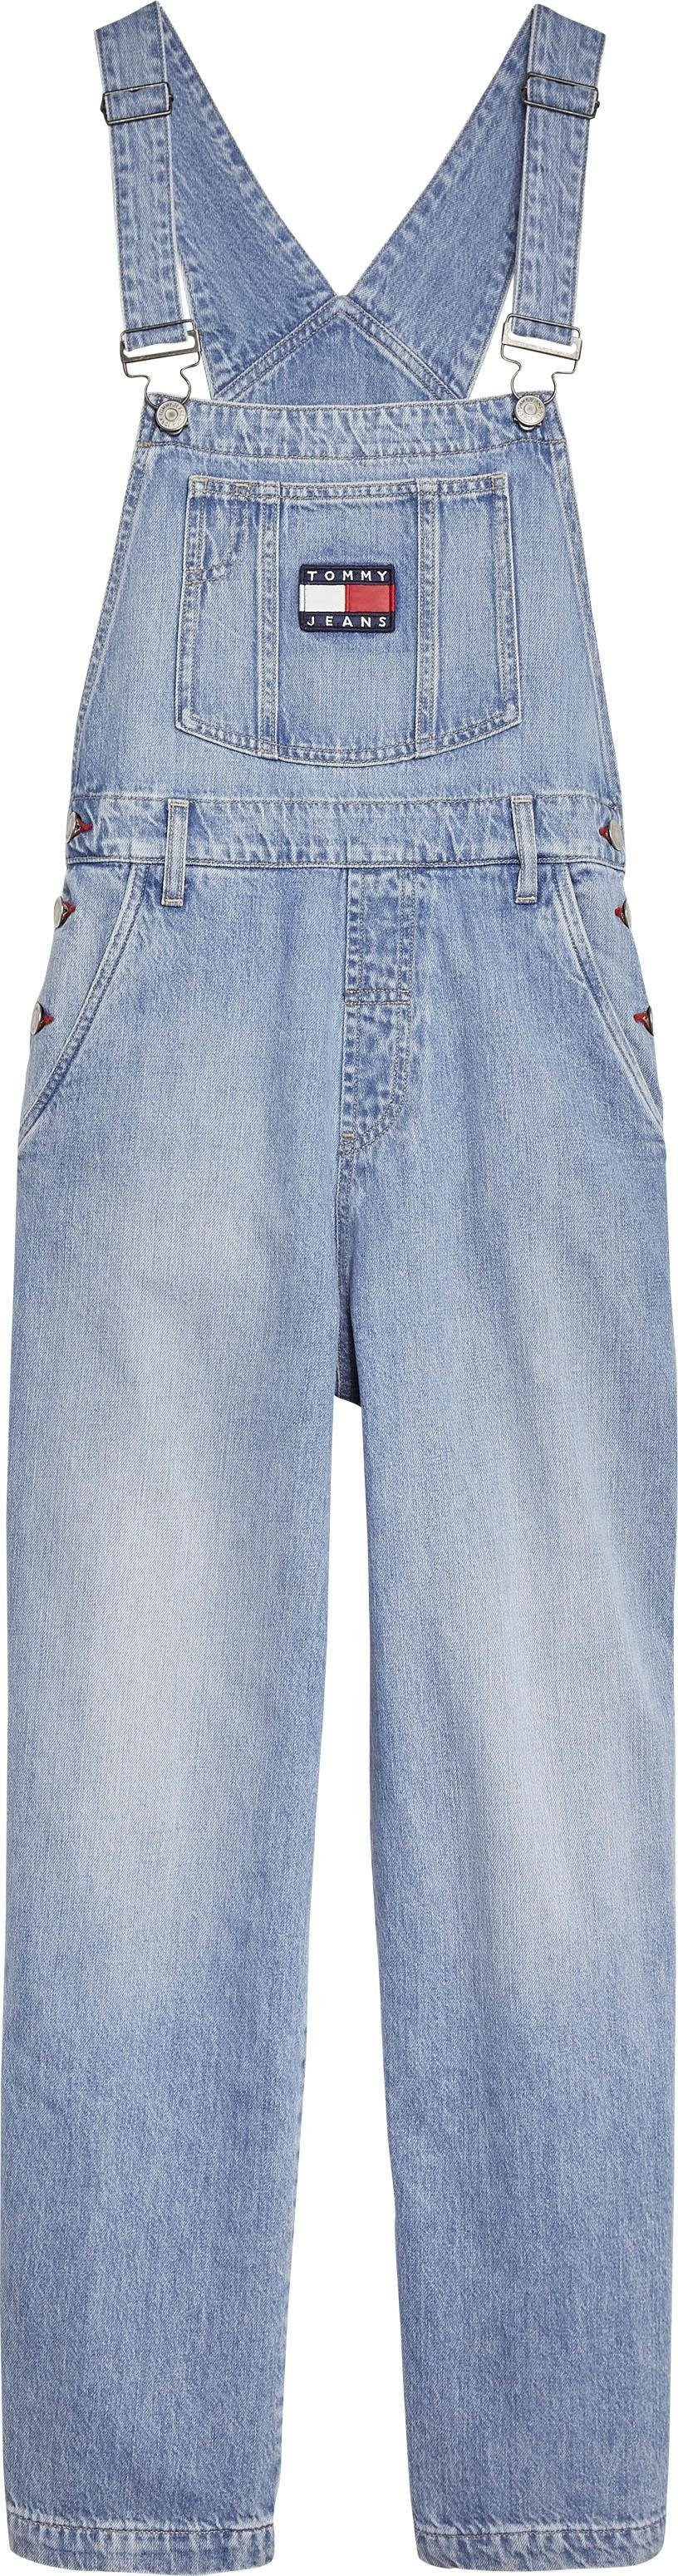 Damen Capri Jeans mit Strass /& Herz Stickerei Shorts Bermuda Jeanshose kurz 9167